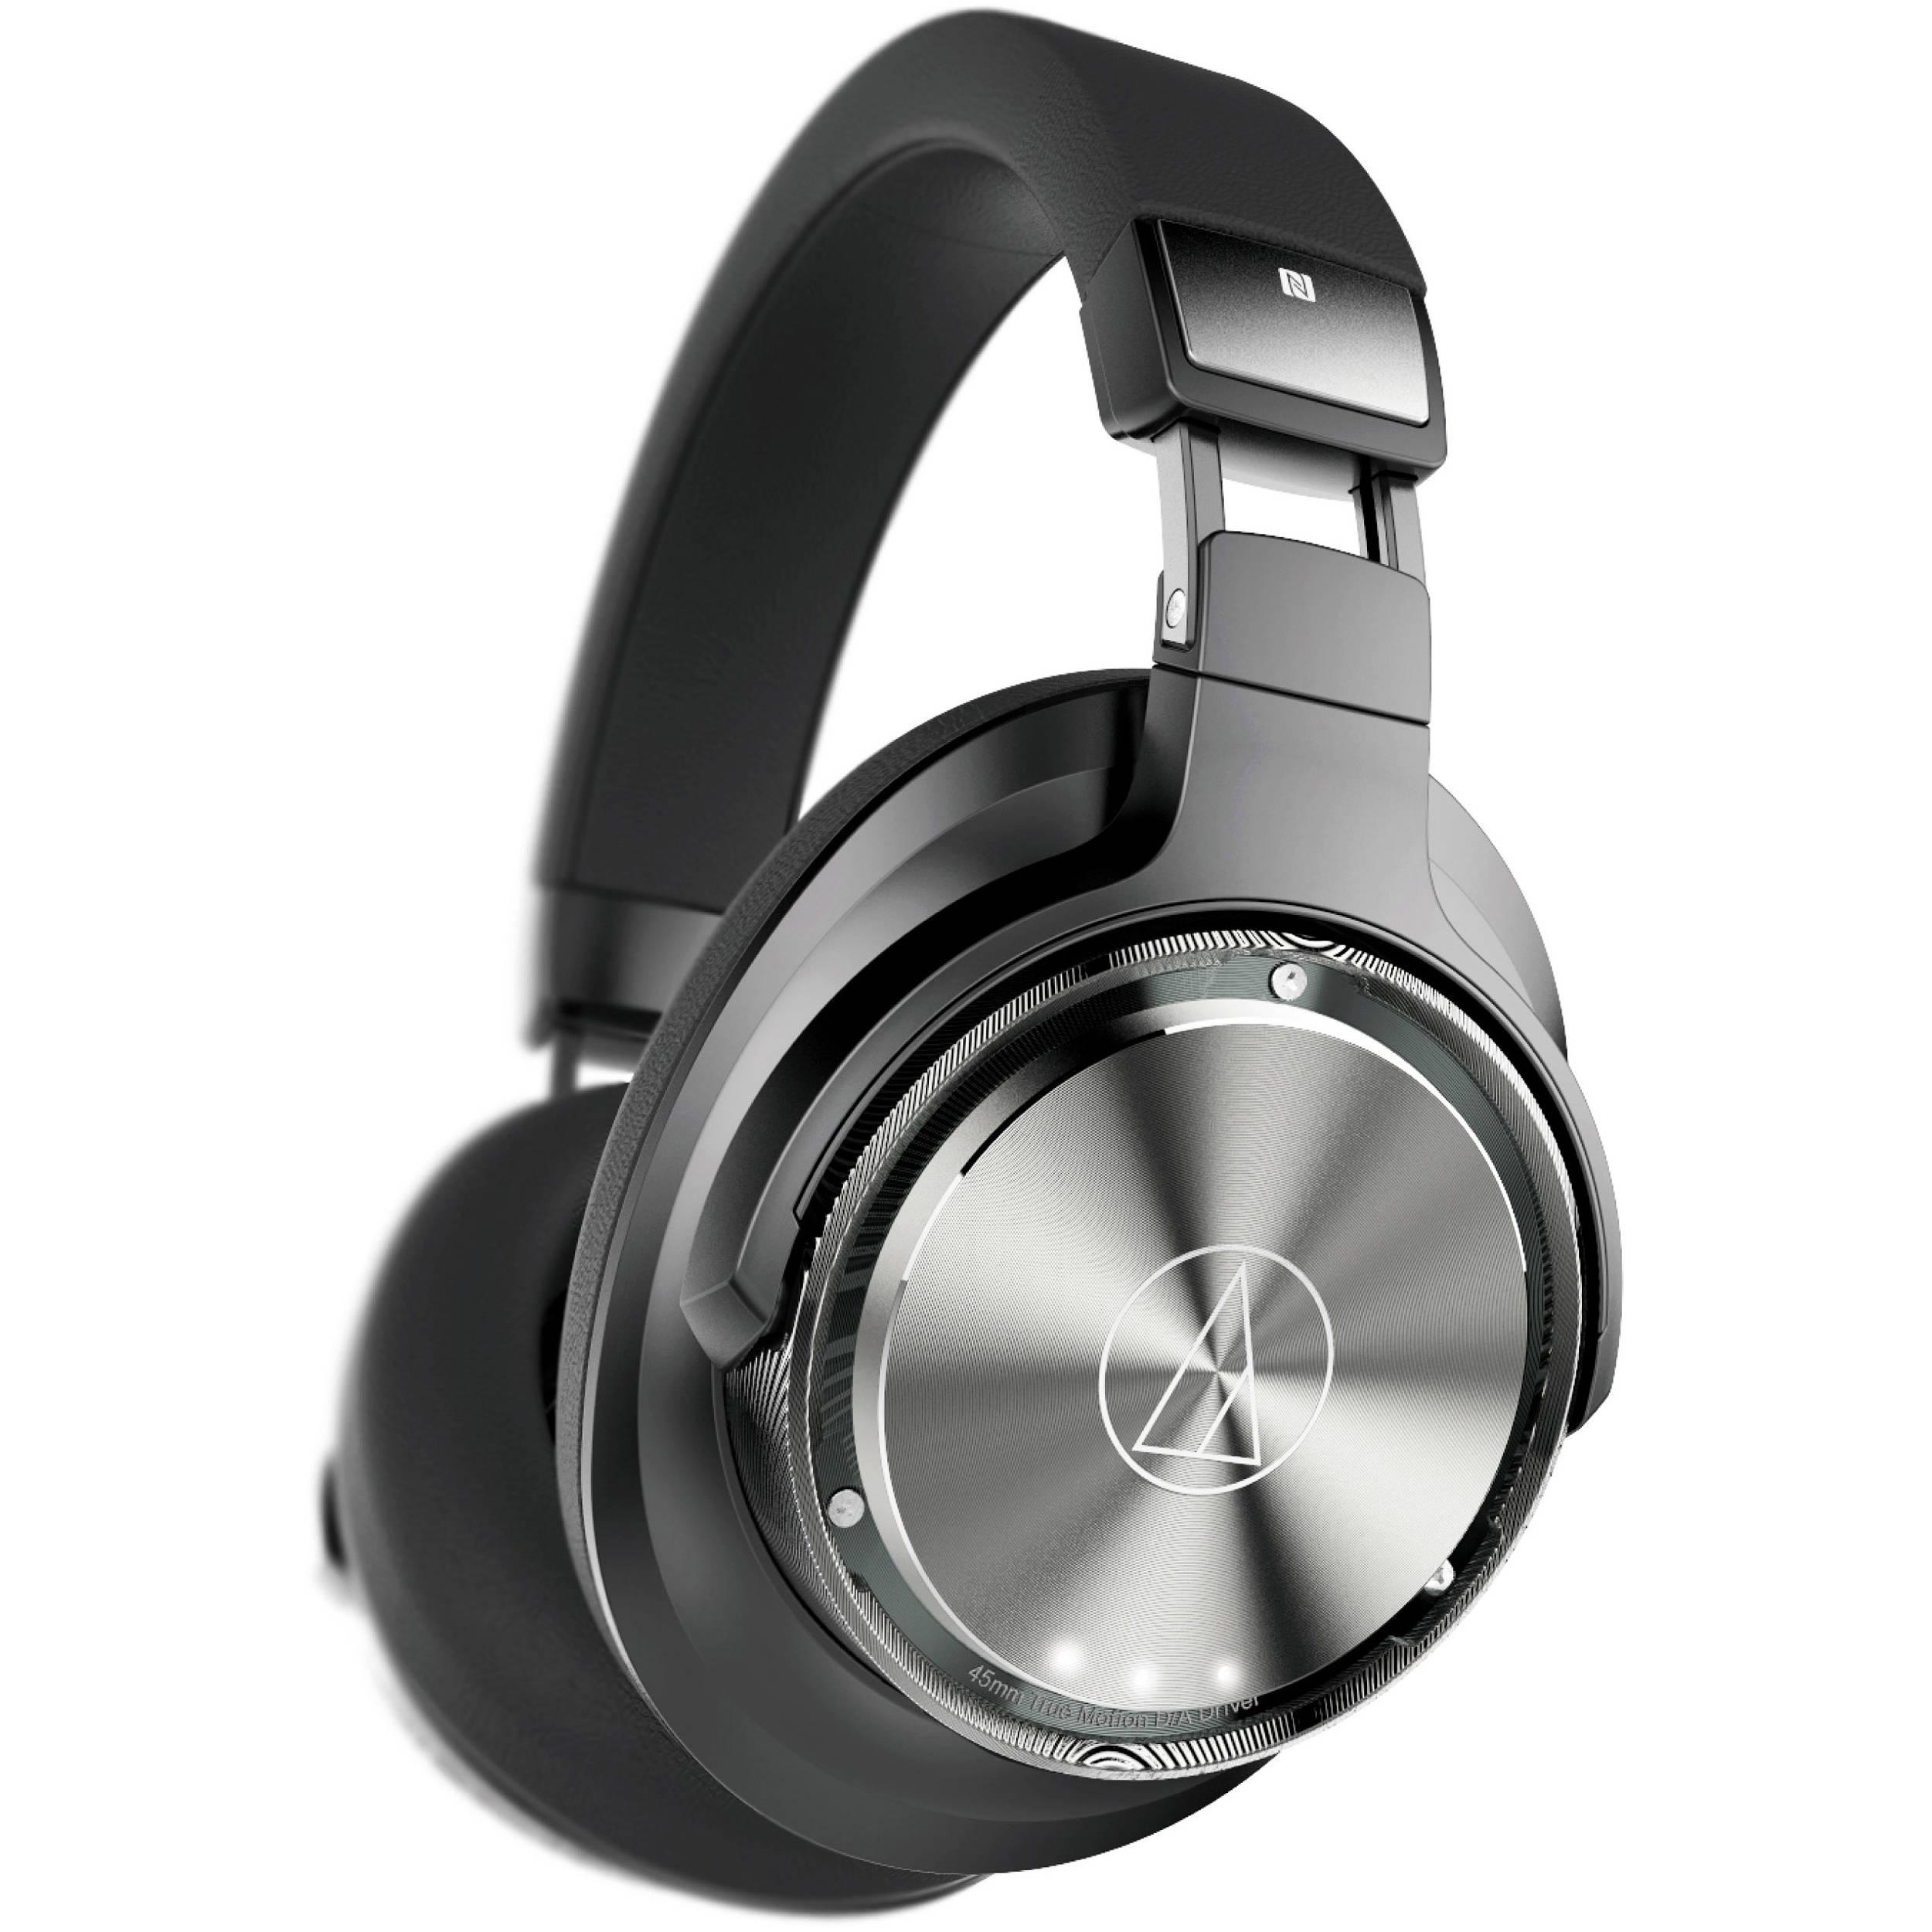 00a9c358cb2da8 Audio-Technica Consumer Wireless Over-Ear Headphones ATH-DSR9BT